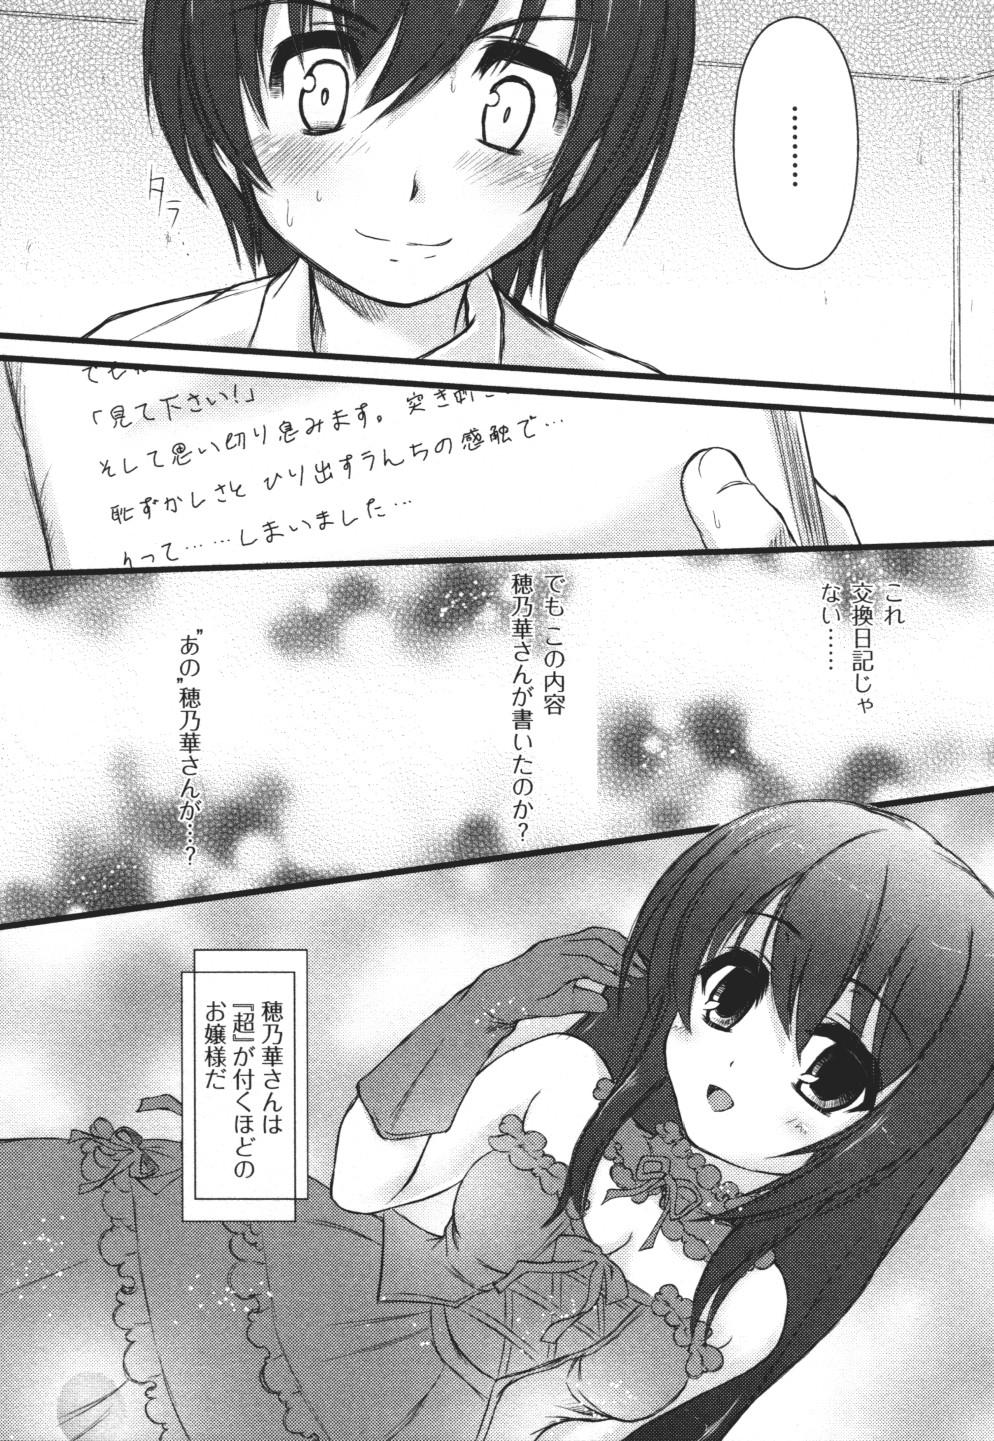 Nozoite wa Ikenai 3 - Do Not Peep! 3 136